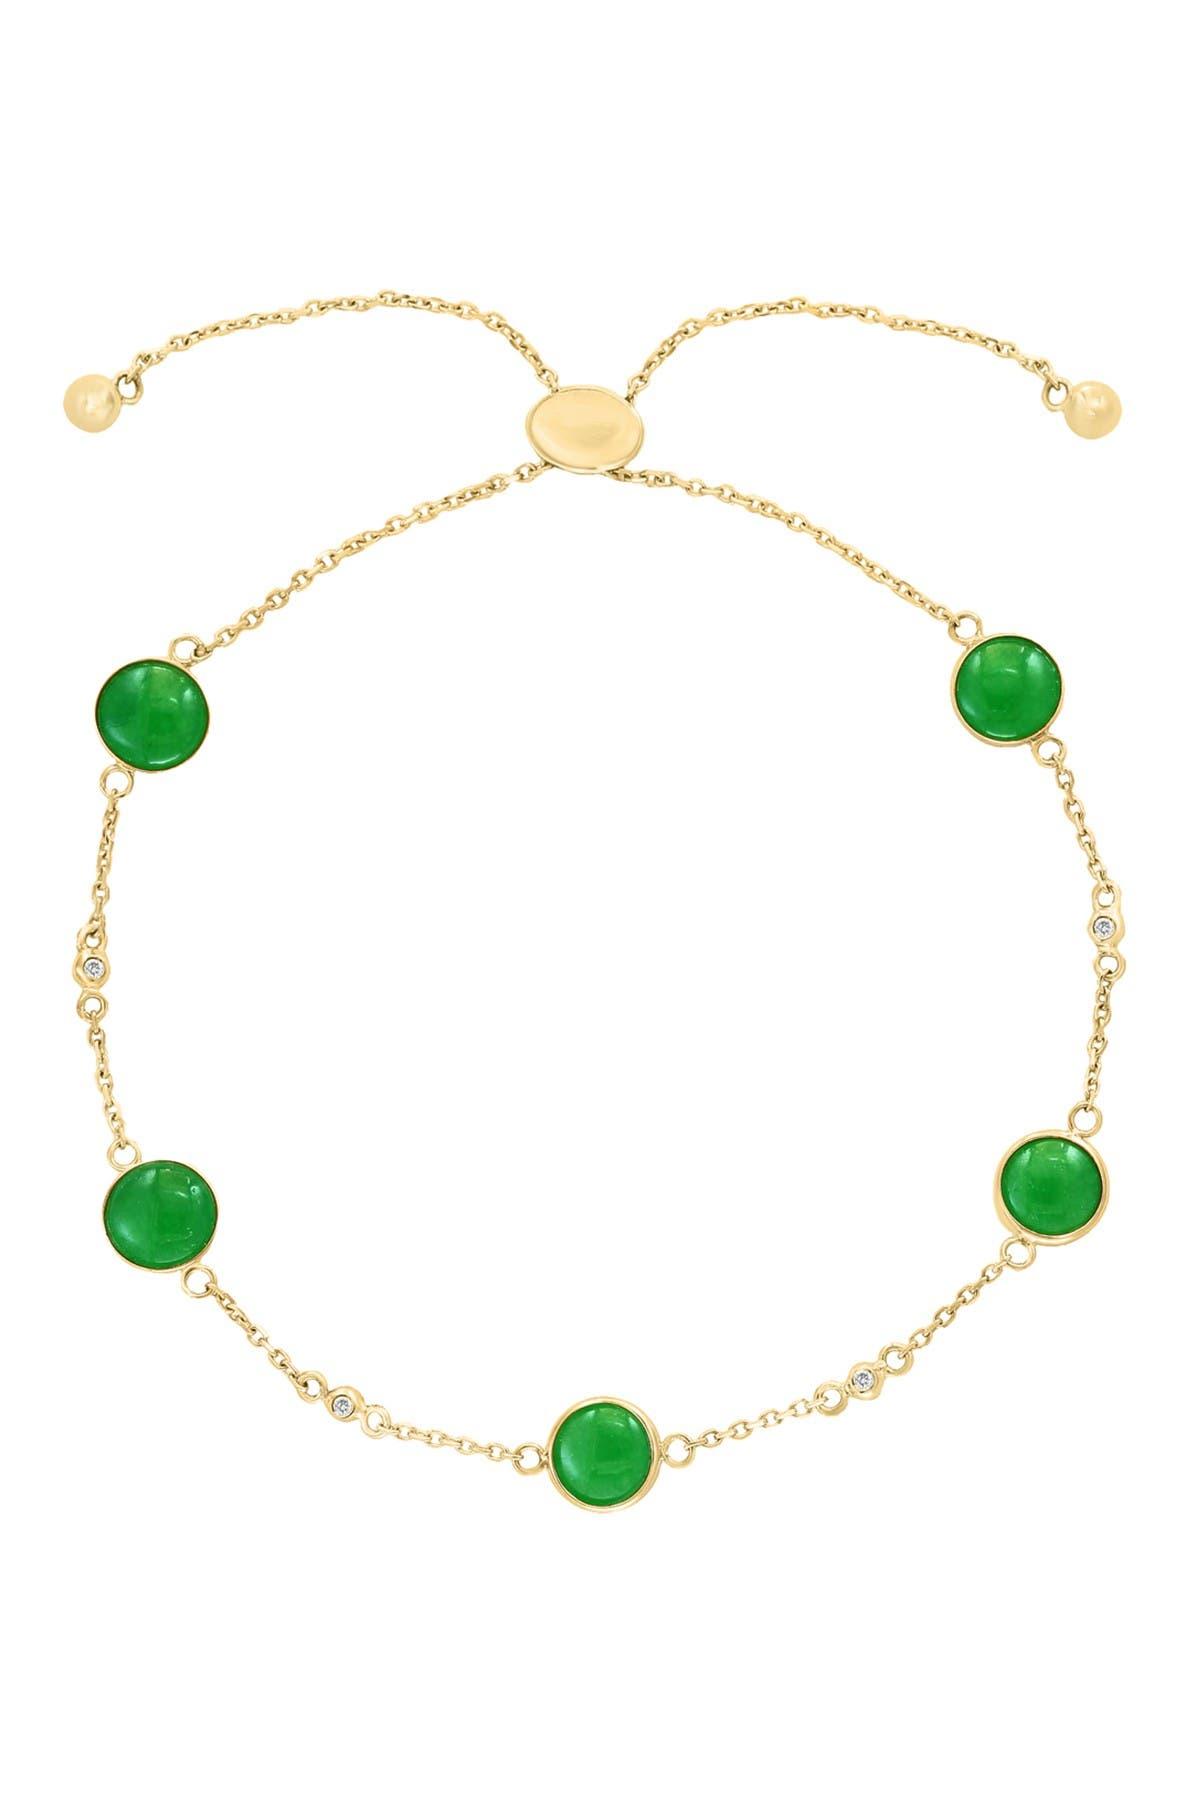 Image of Effy 14K Yellow Gold Bezel Set Green Jade & White Sapphire Station Adjustable Slide Bracelet